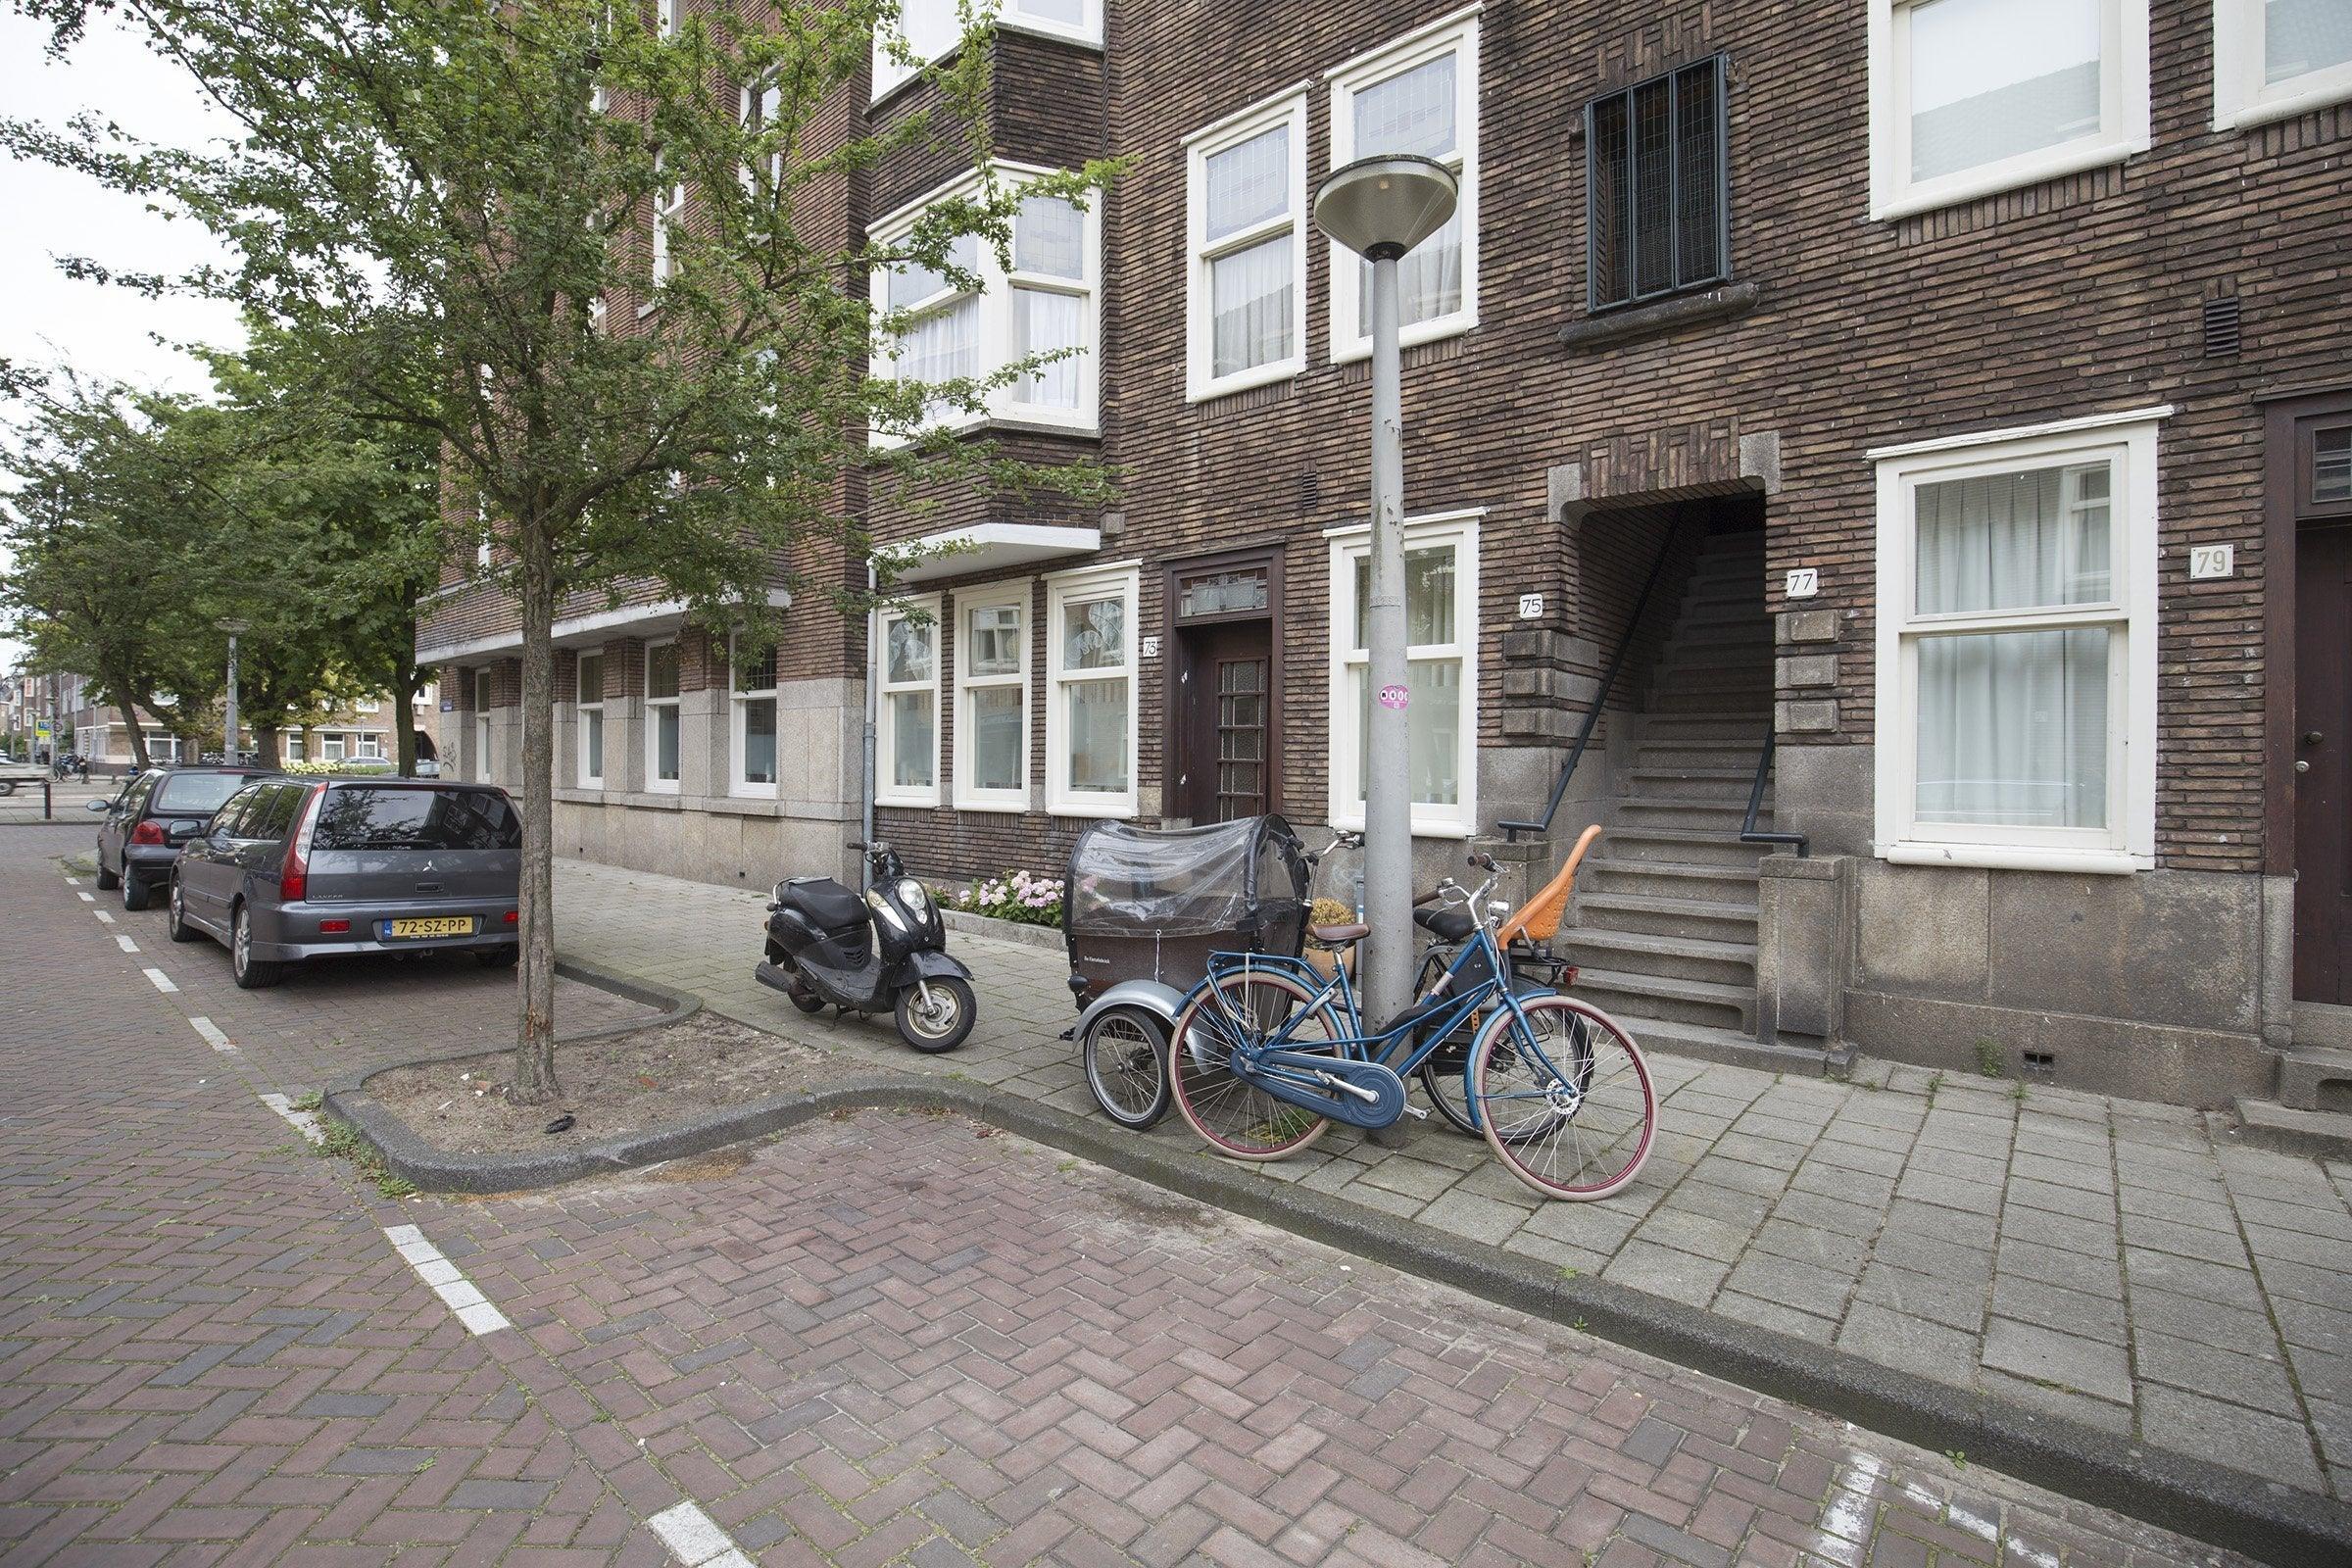 https://public.parariusoffice.nl/15/photos/huge/51297712.1504079776-35.jpg